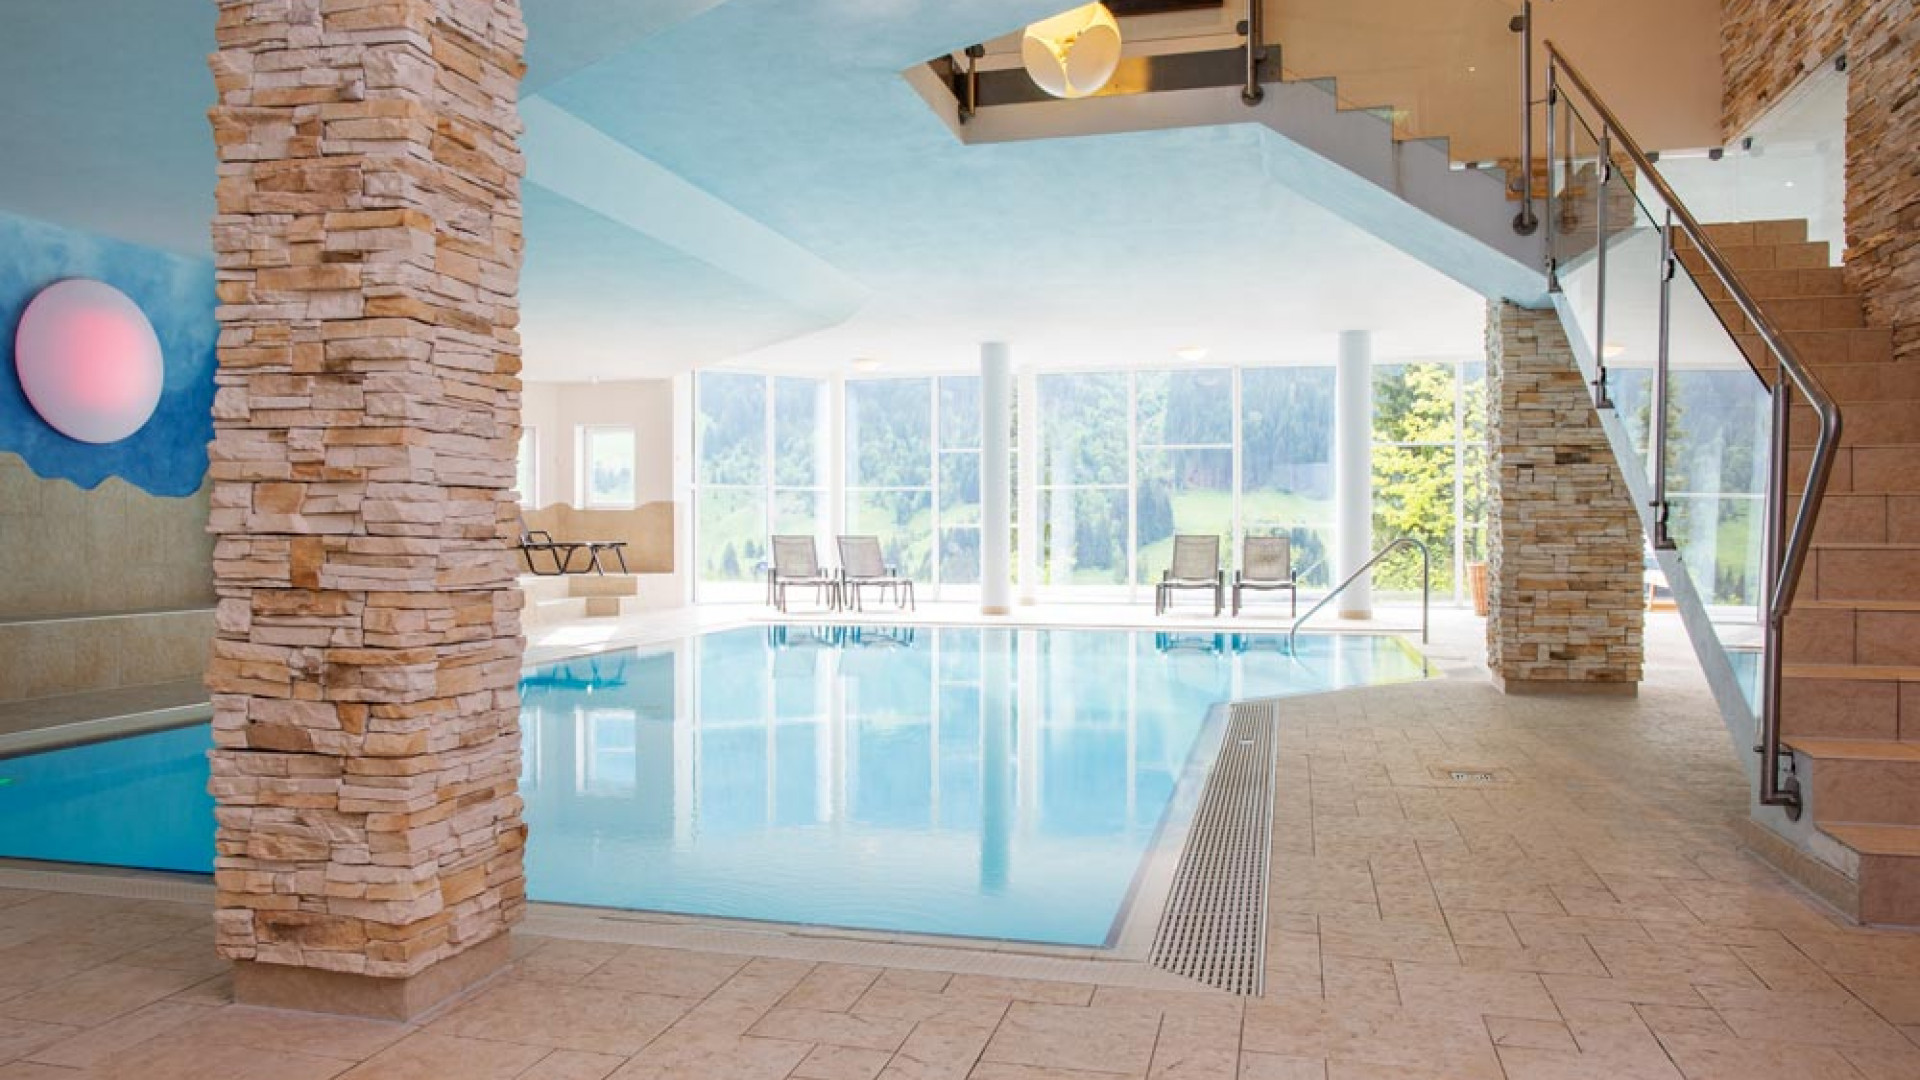 Swimming pool at Alphotel, Austria